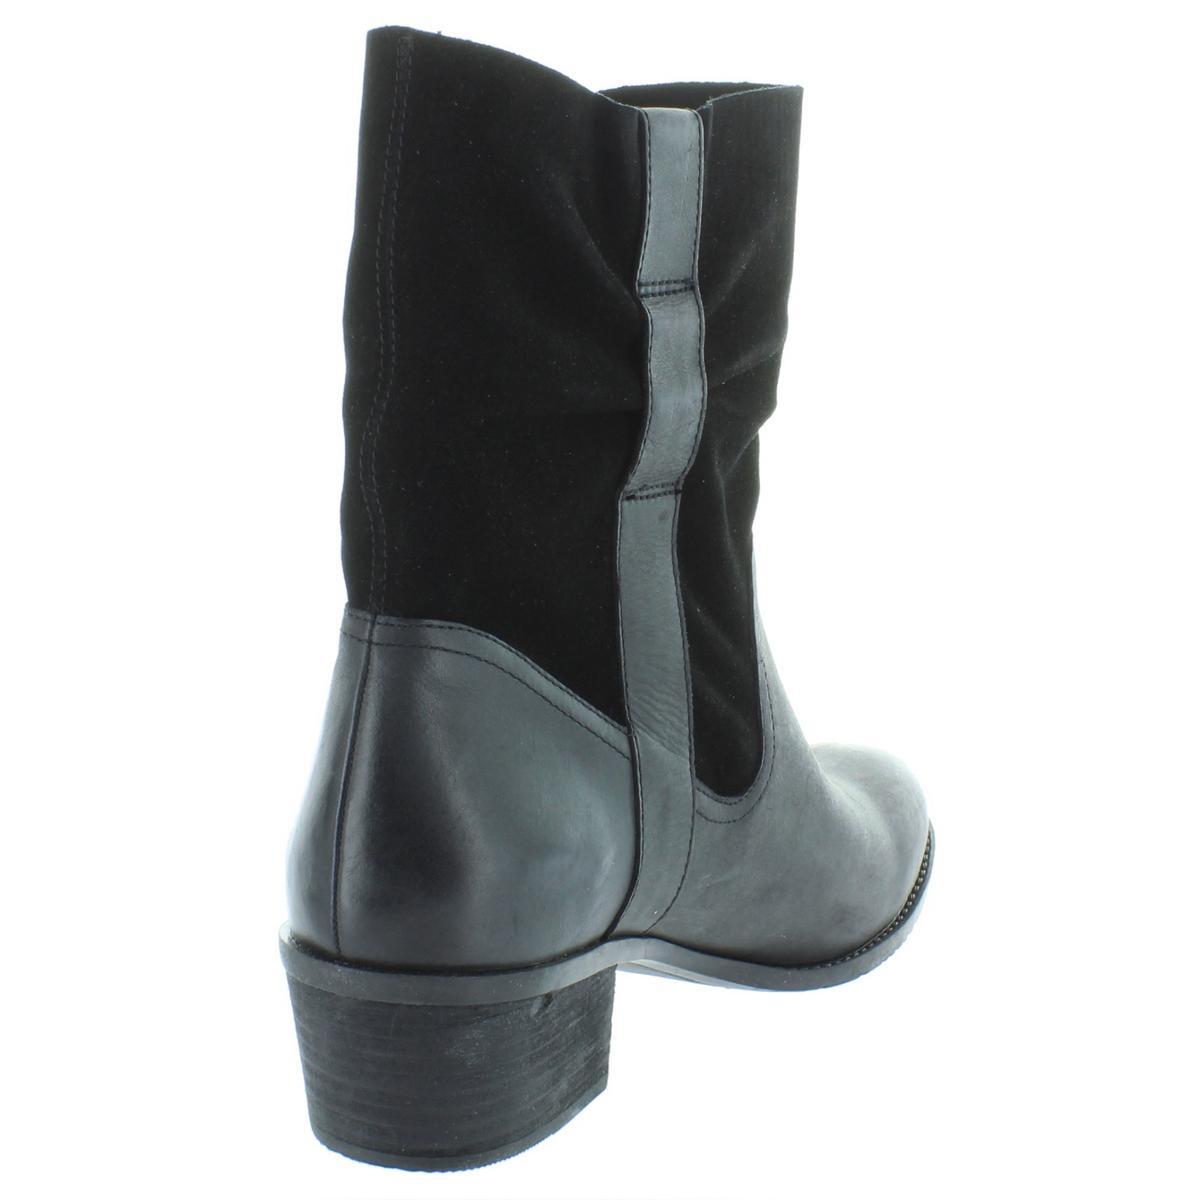 9febfa7068171 Details about Umberto Raffini Womens Kiki Black Ankle Booties Shoes 41  Medium (B,M) BHFO 4328